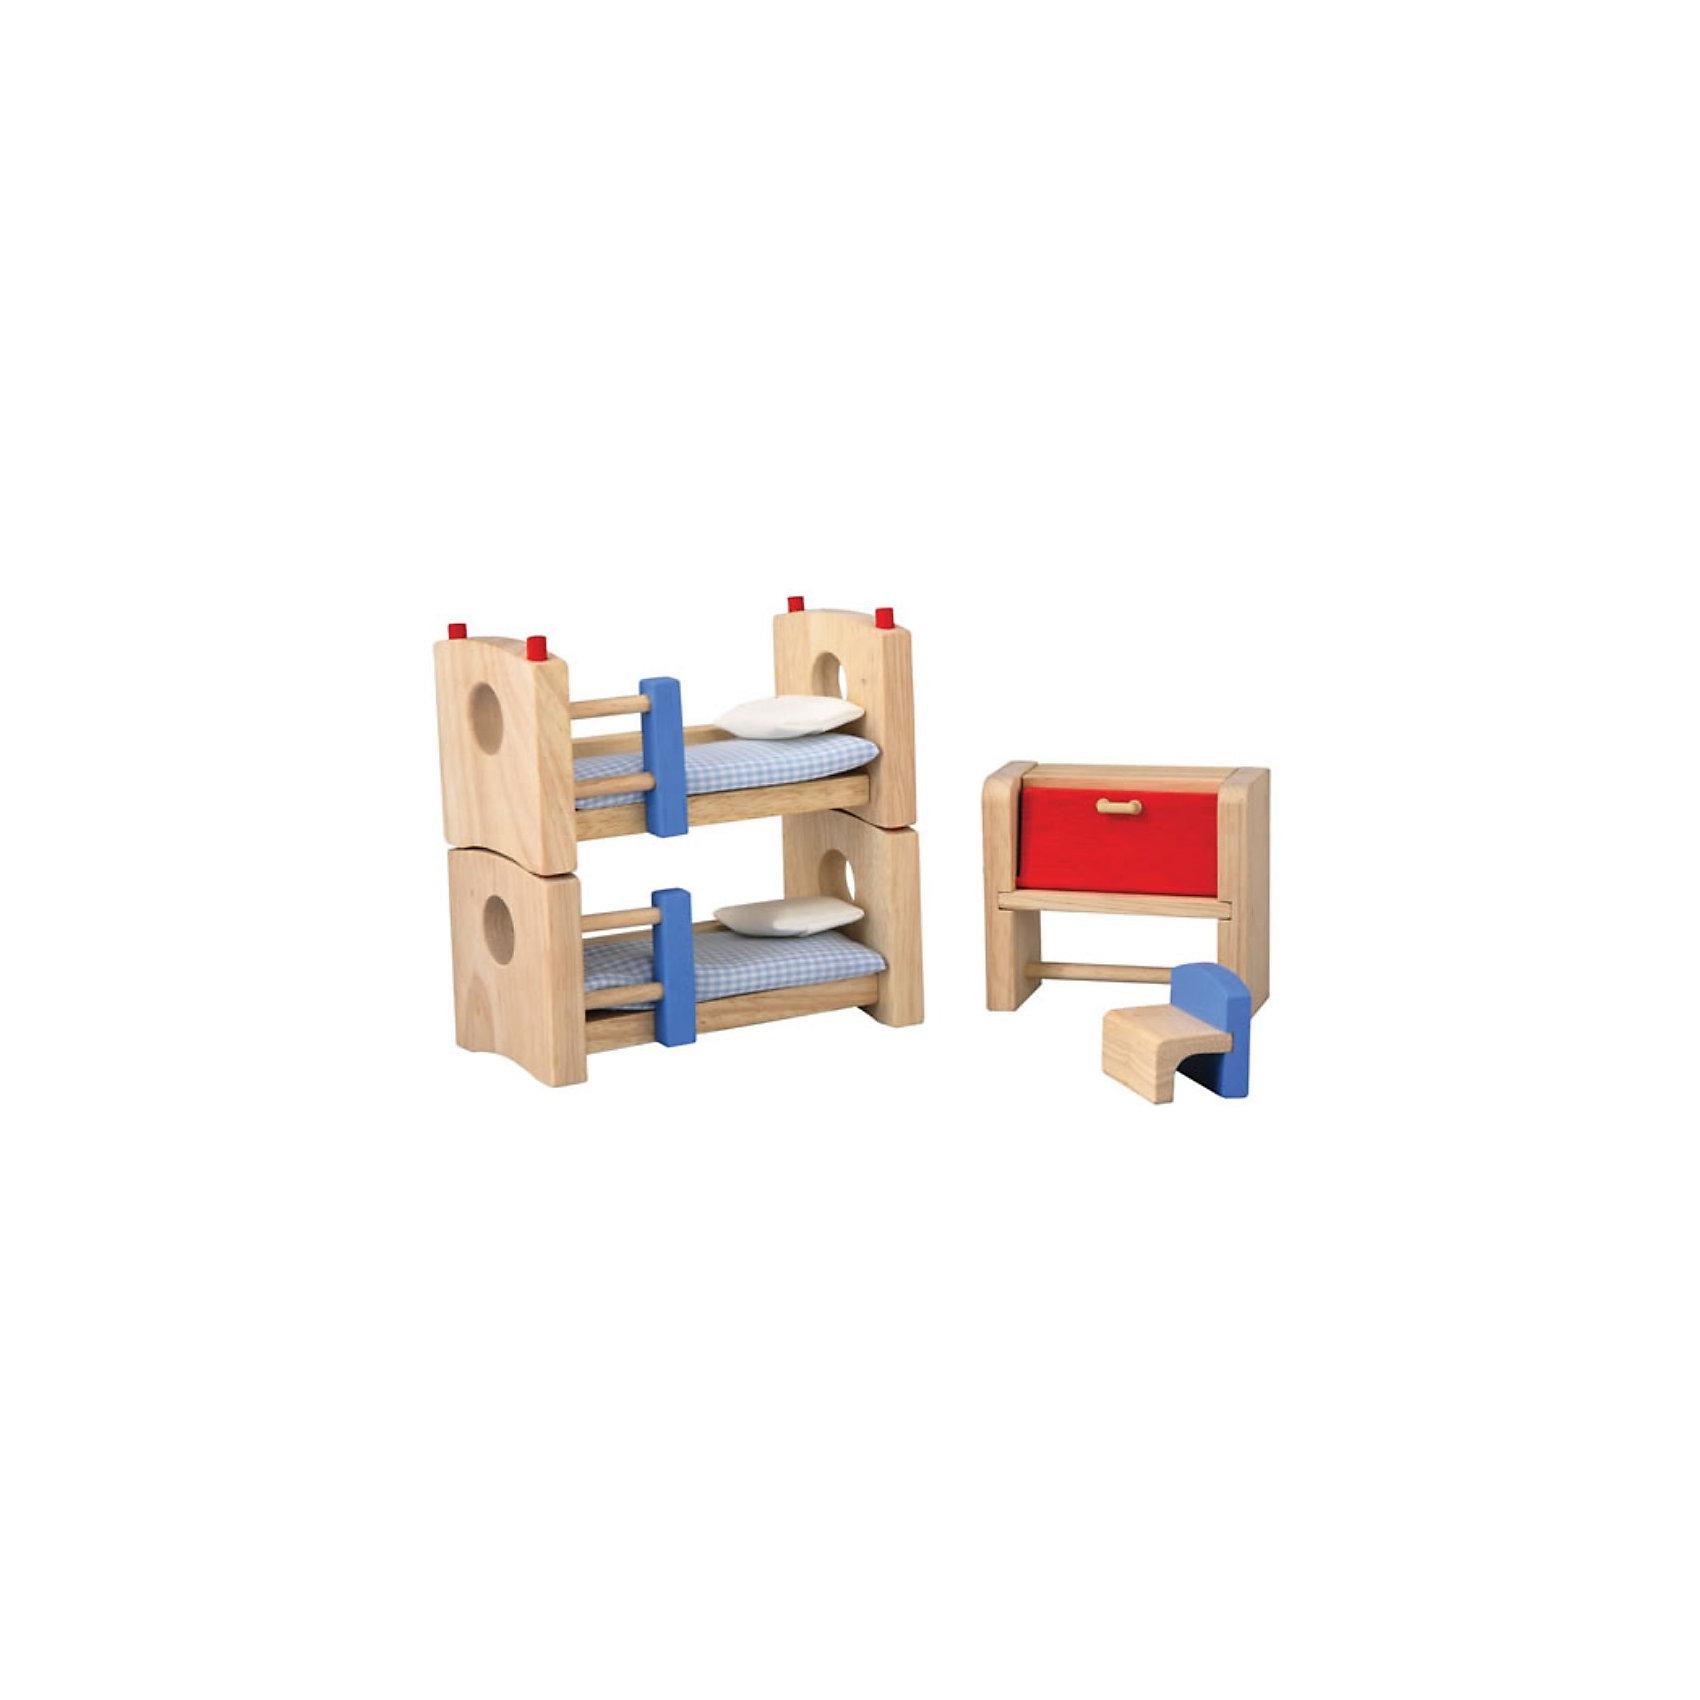 Plan Toys PLAN TOYS 7304 Детская Neo ходунки plan toys ходилка птица